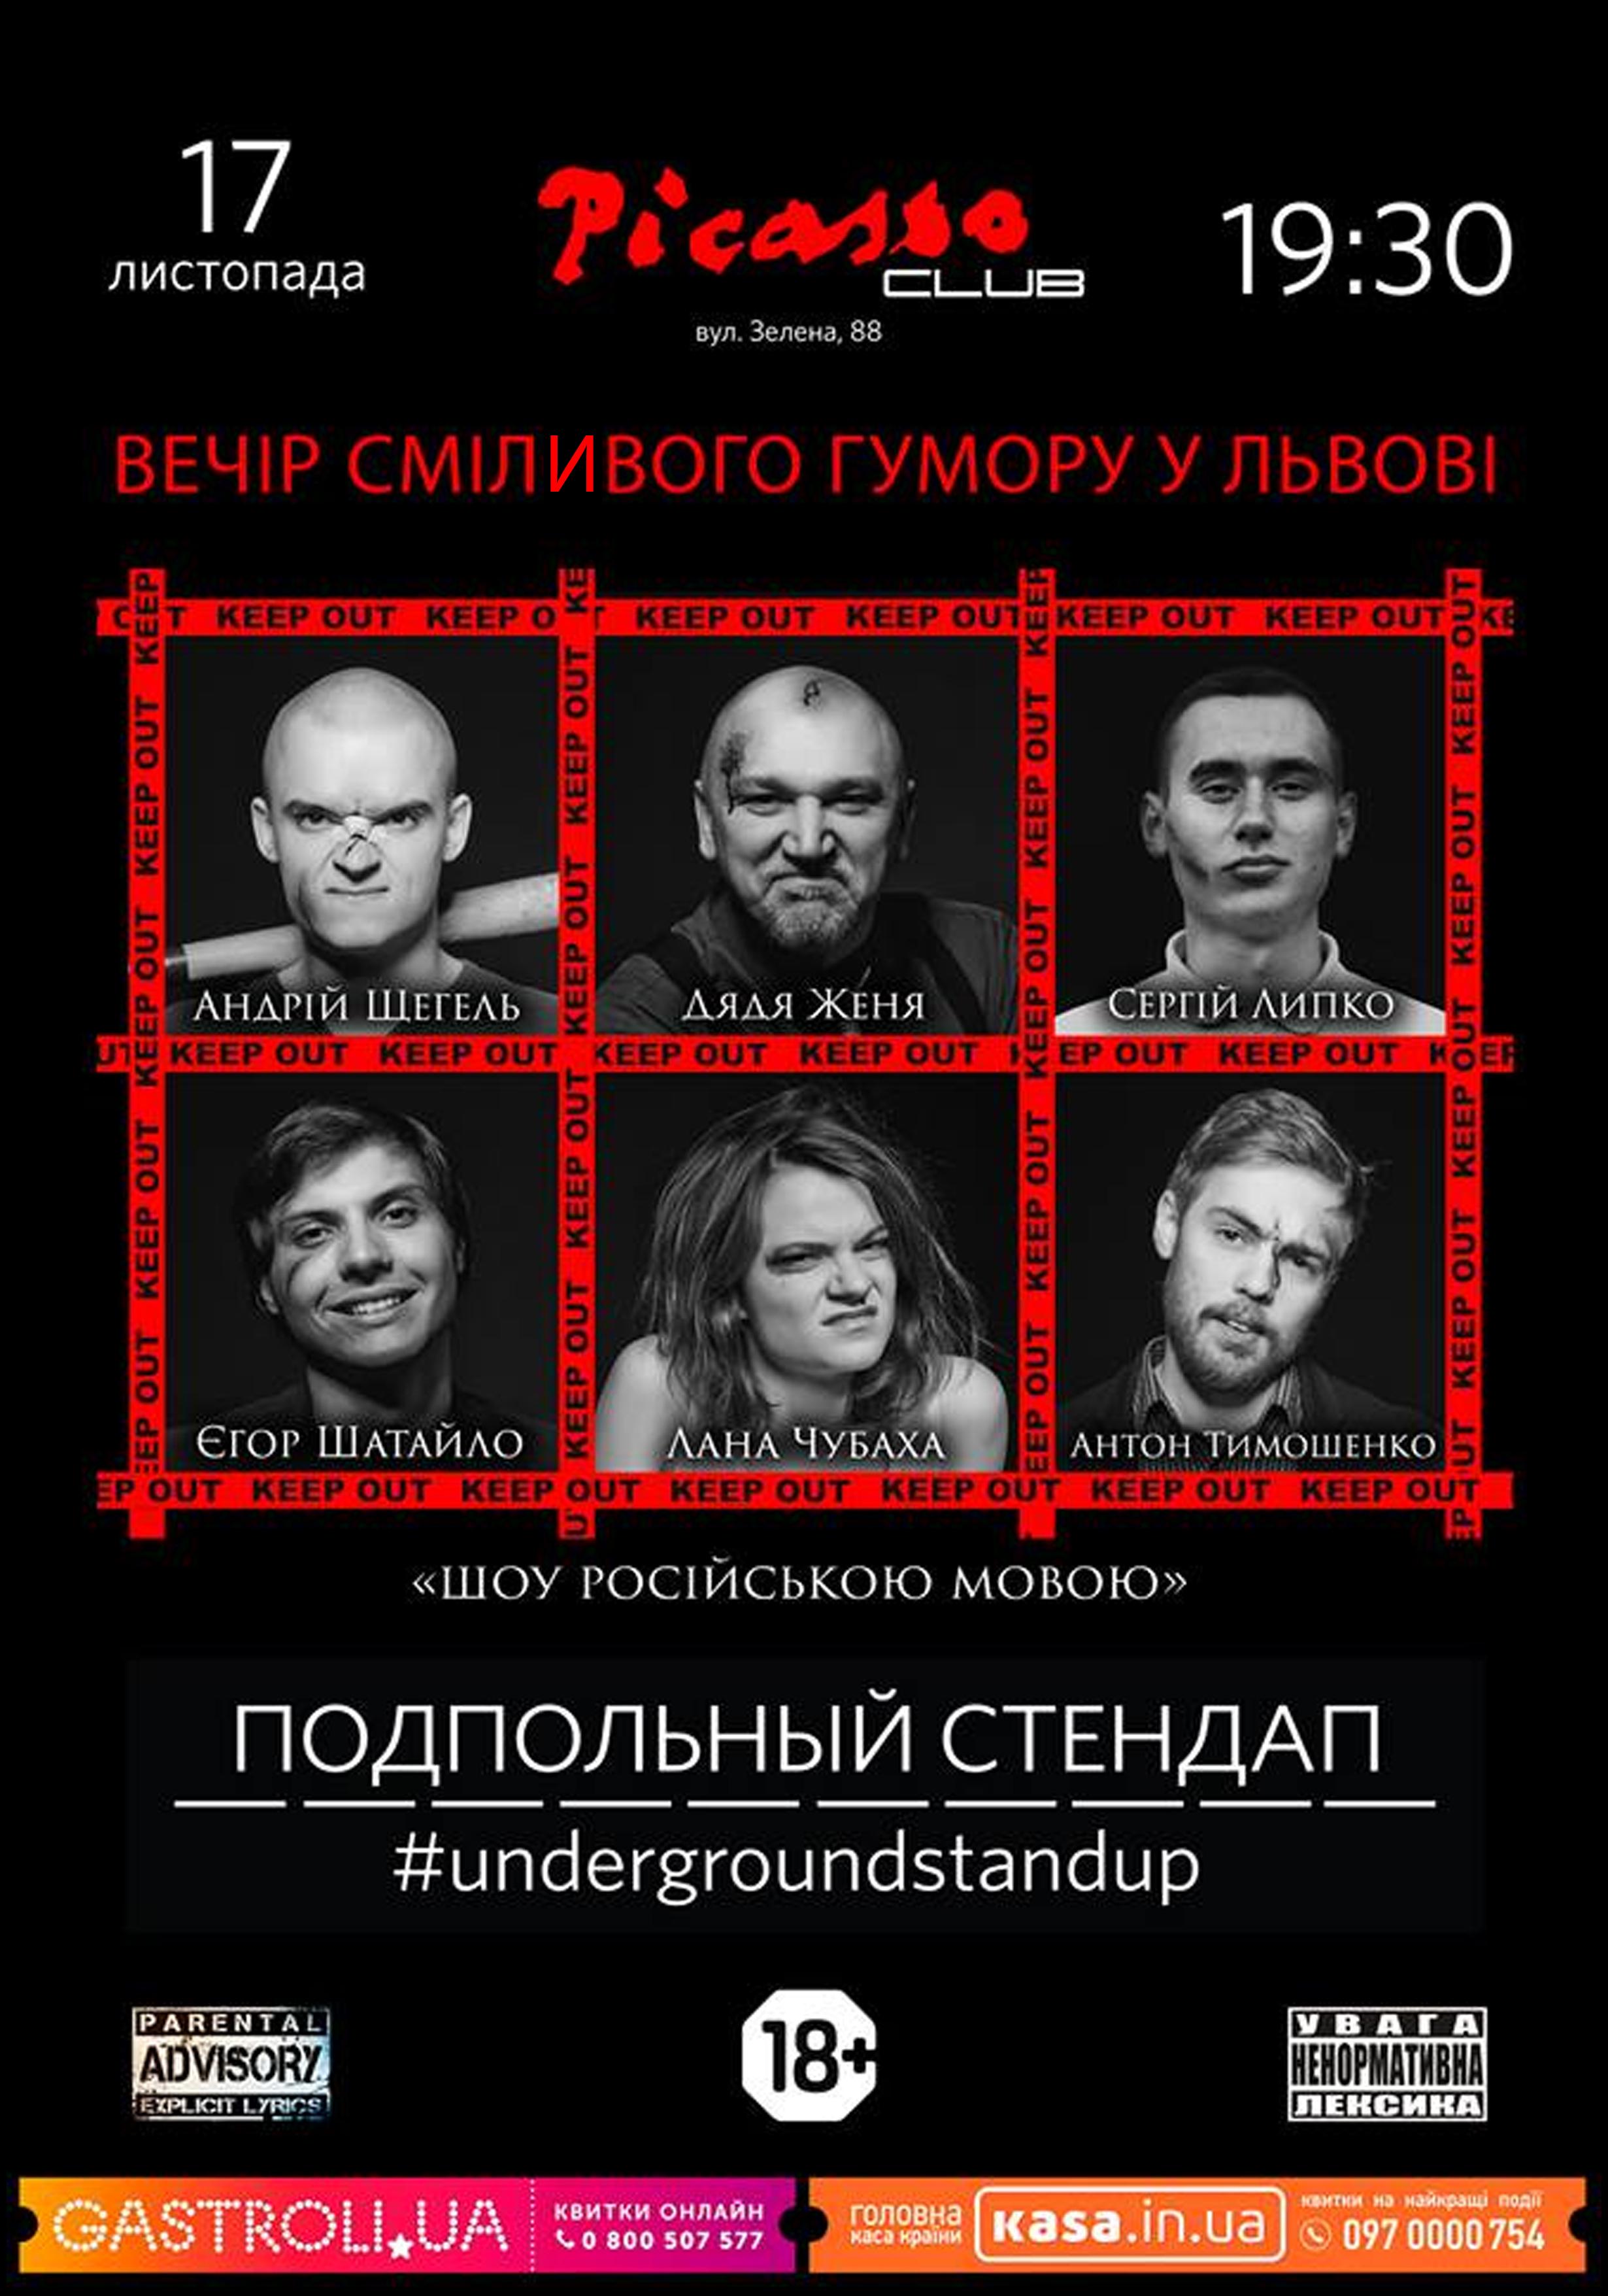 Підпільний Стендап / Underground Stand Up - СКАСОВАНО!